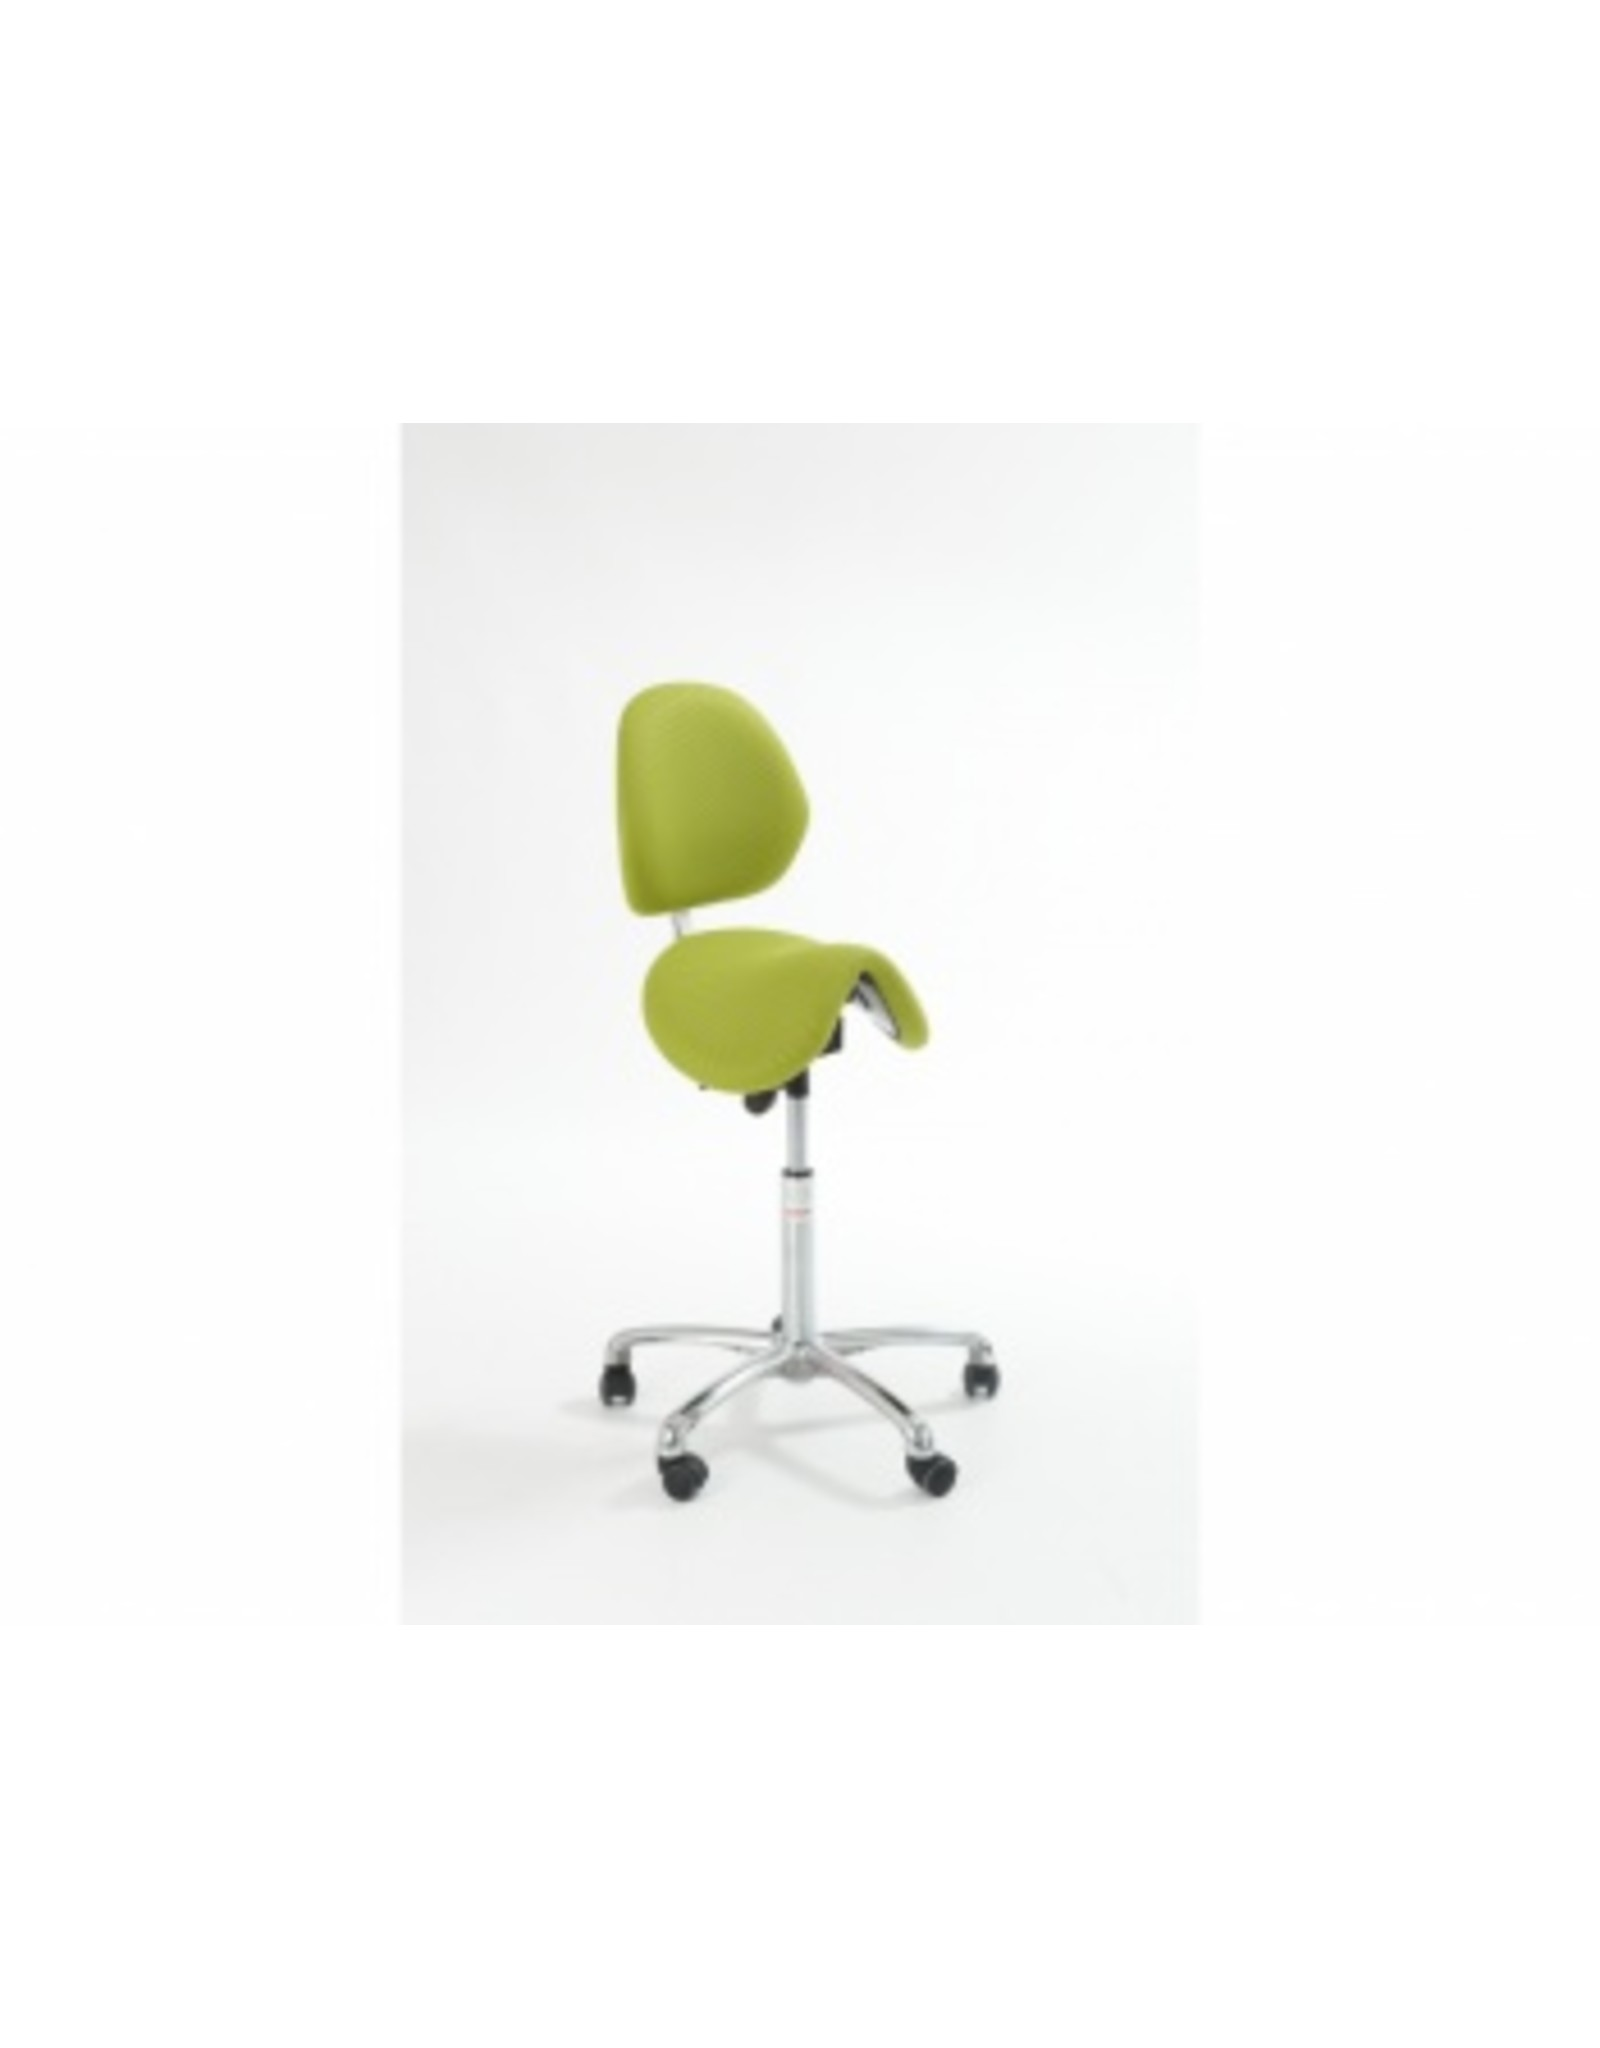 Pinto saddle stool